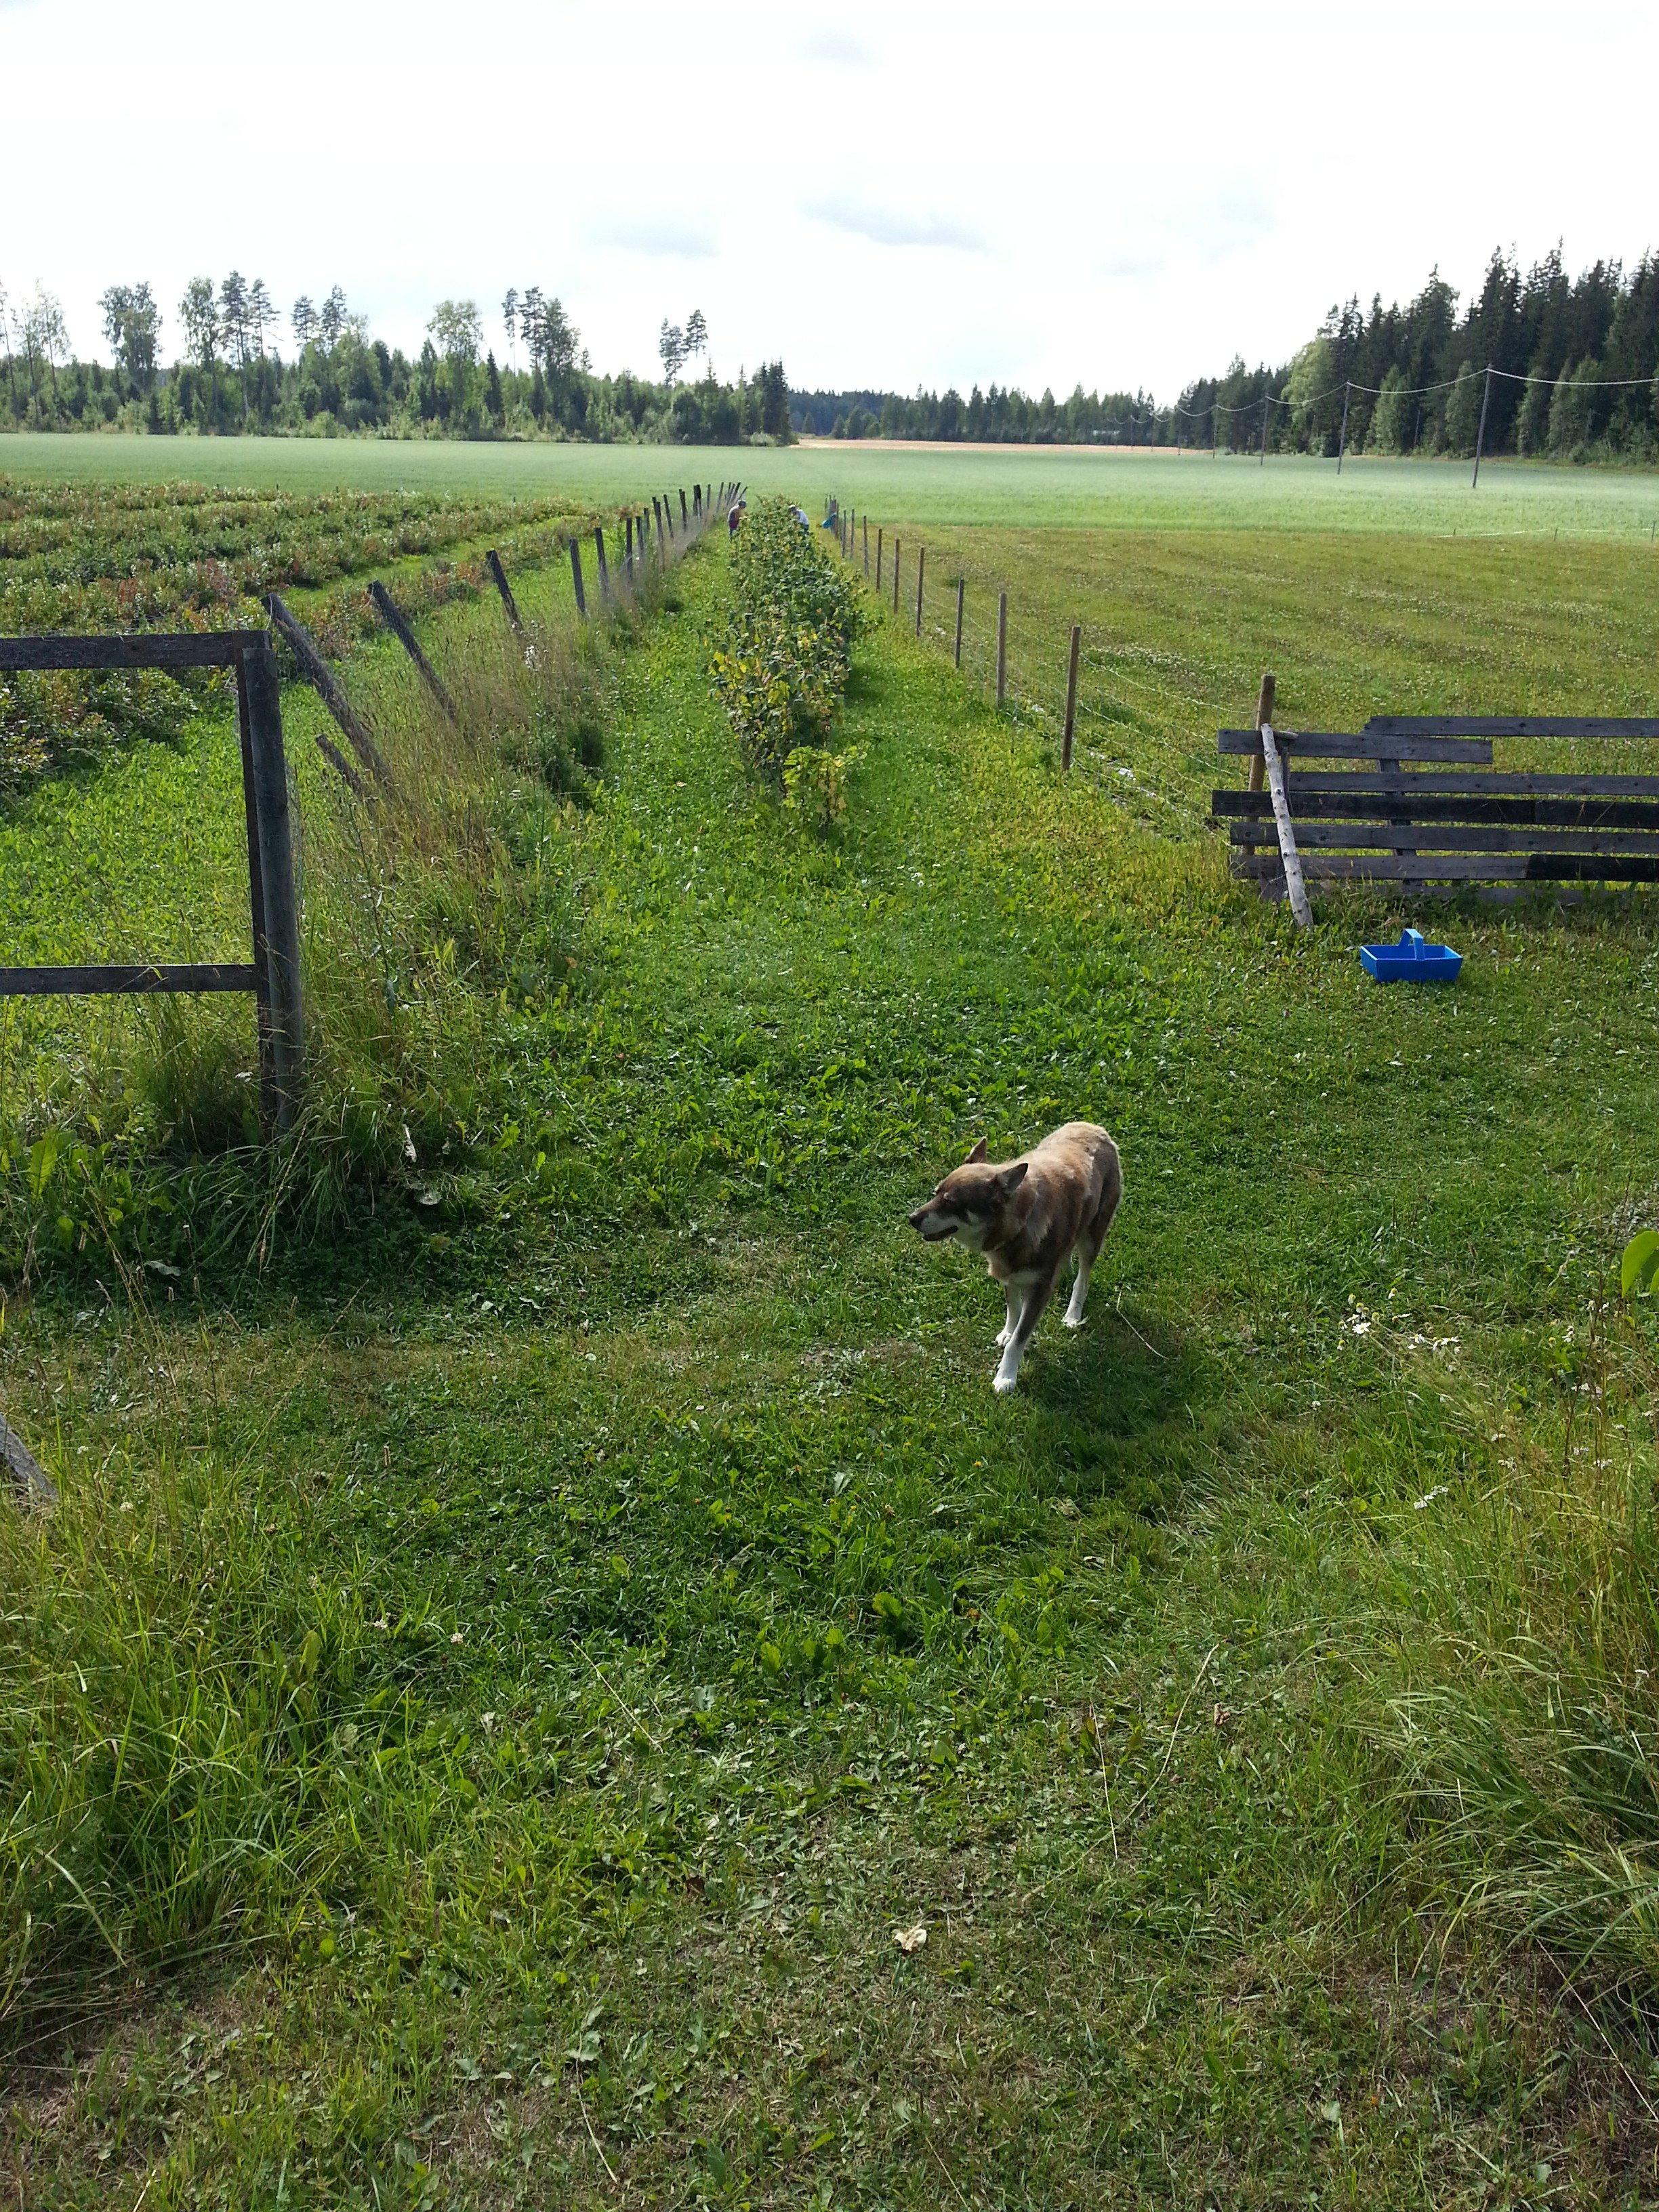 The farm's friendly Lapland Husky dog